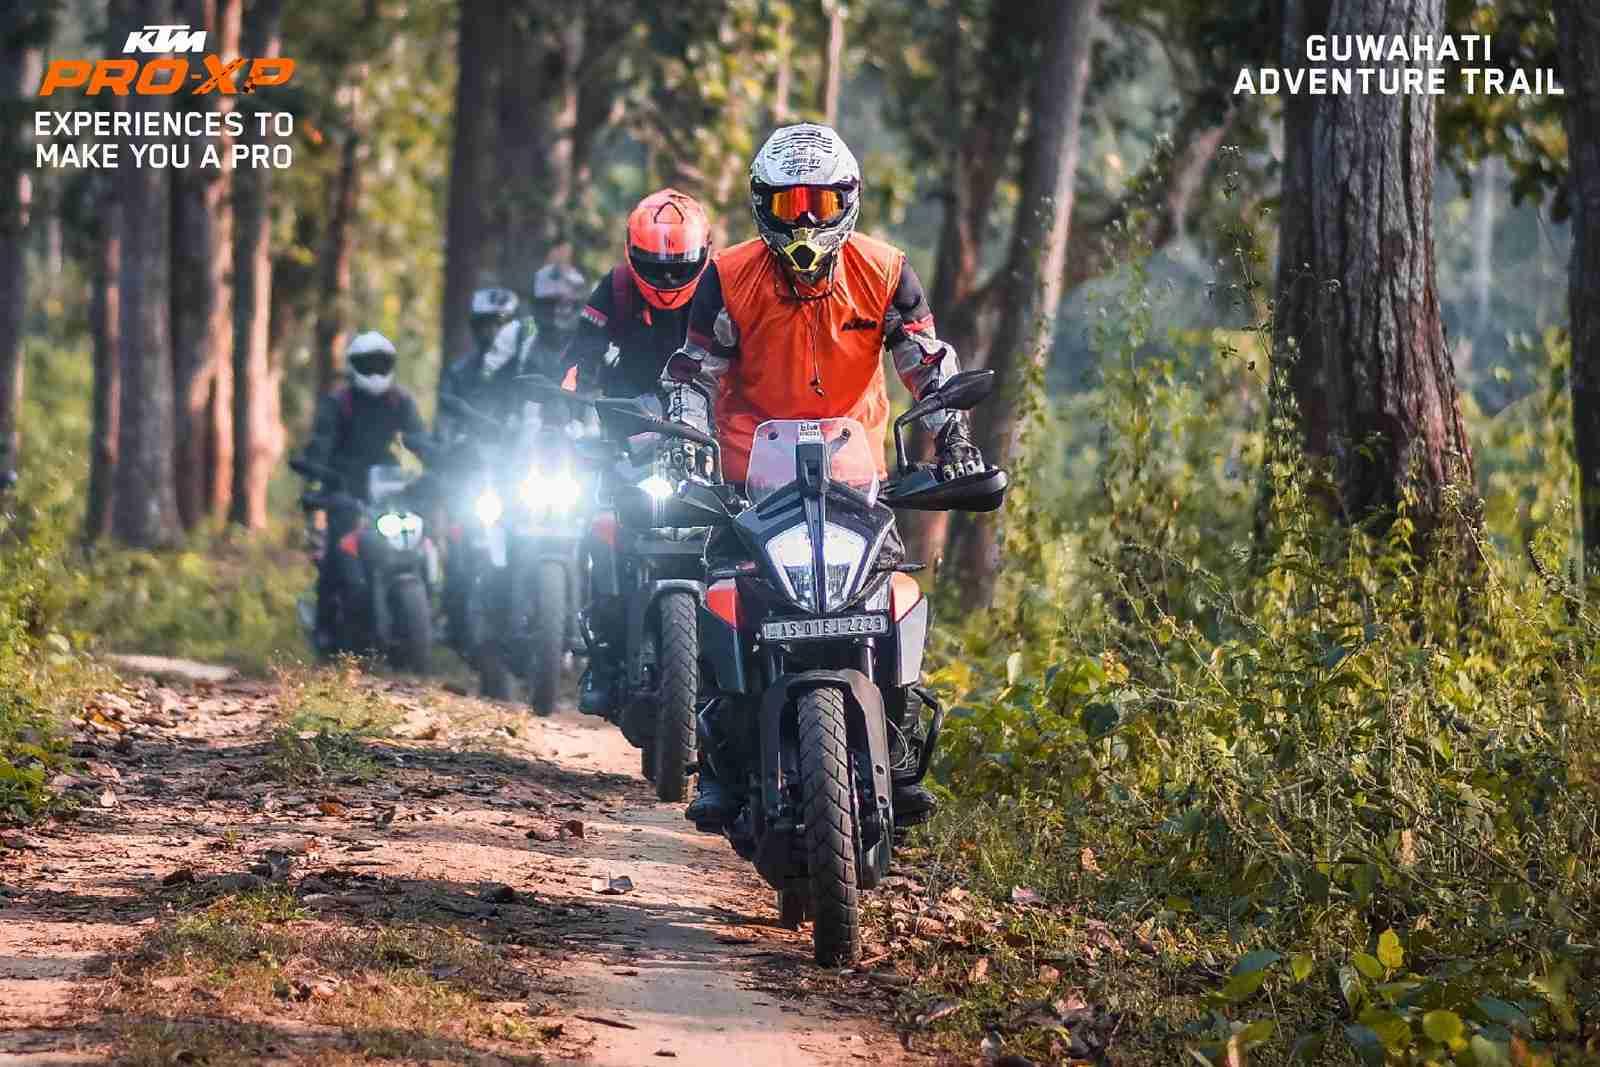 KTM India Pro-XP rides Adventure Trail